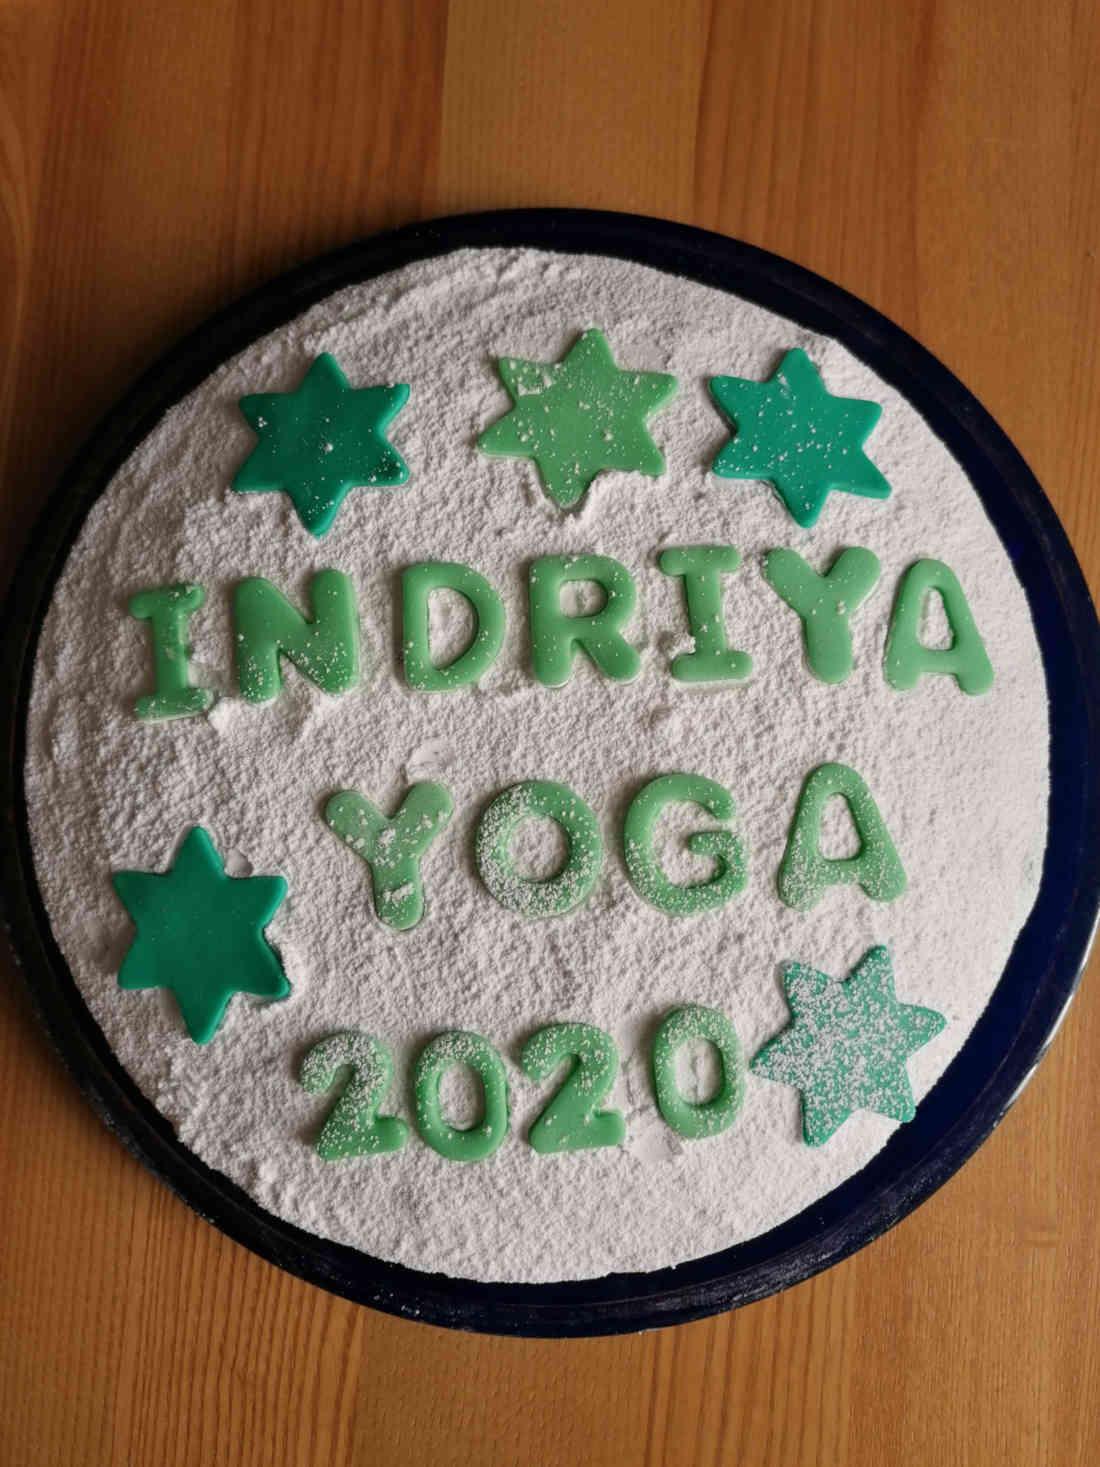 Indriya Yoga Βασιλόπιτα 2020